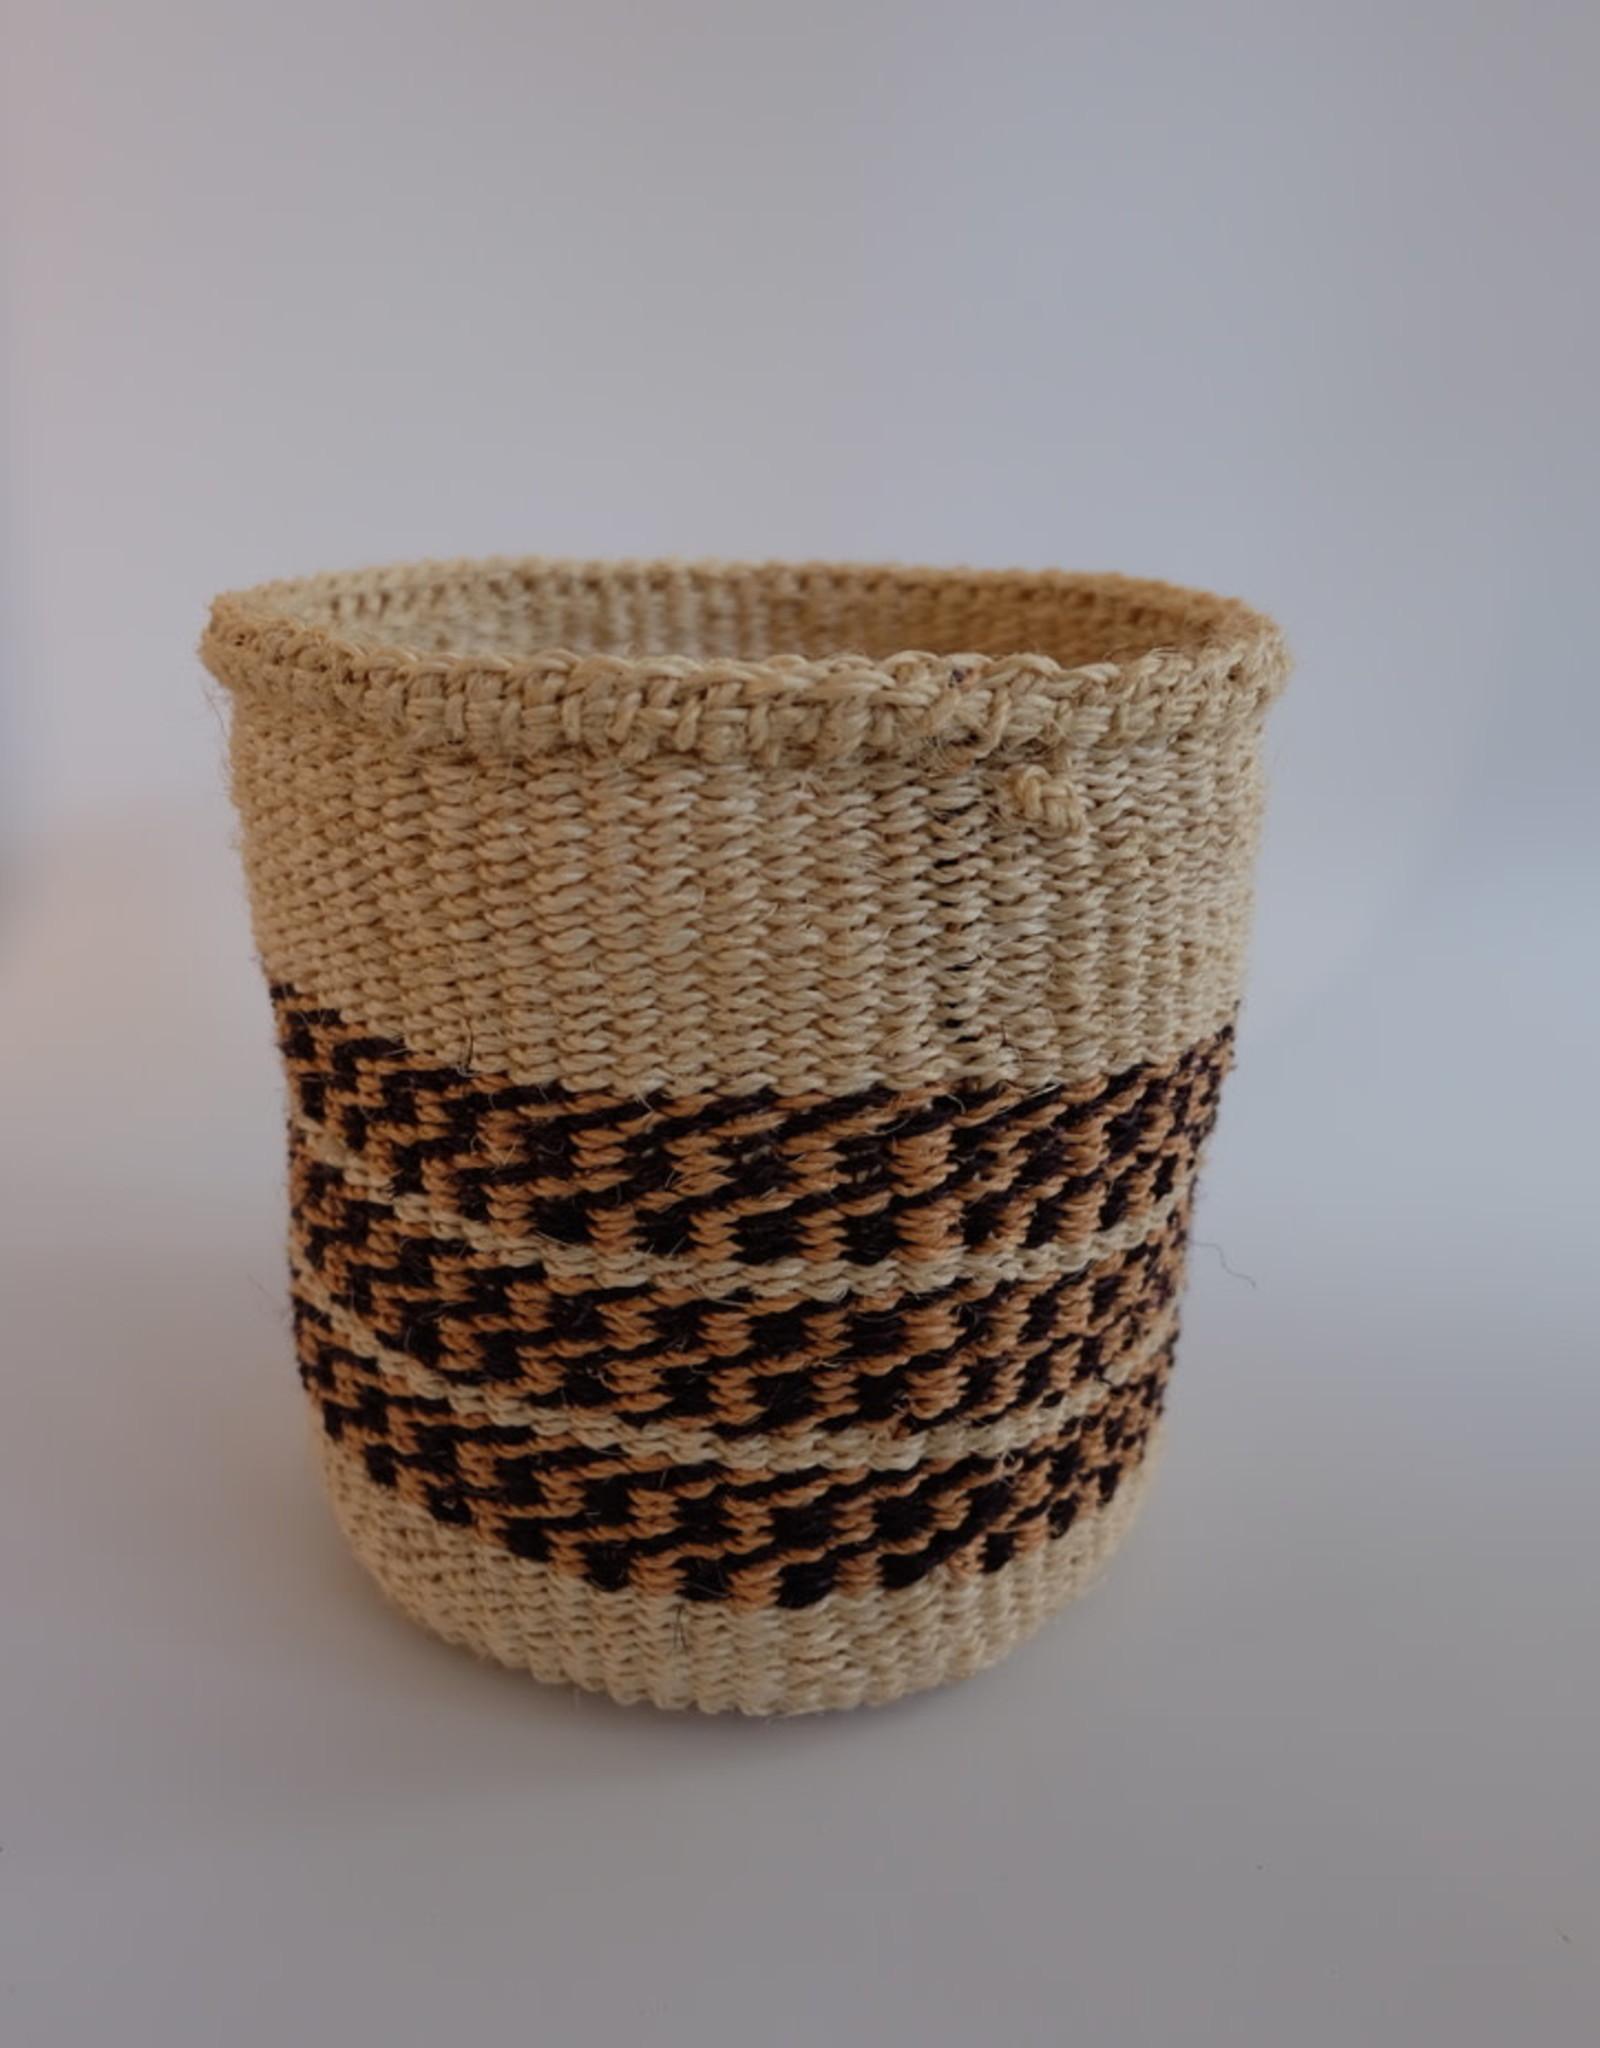 Solid Crafts Hadithi Basket S - black & brown by Anjeline